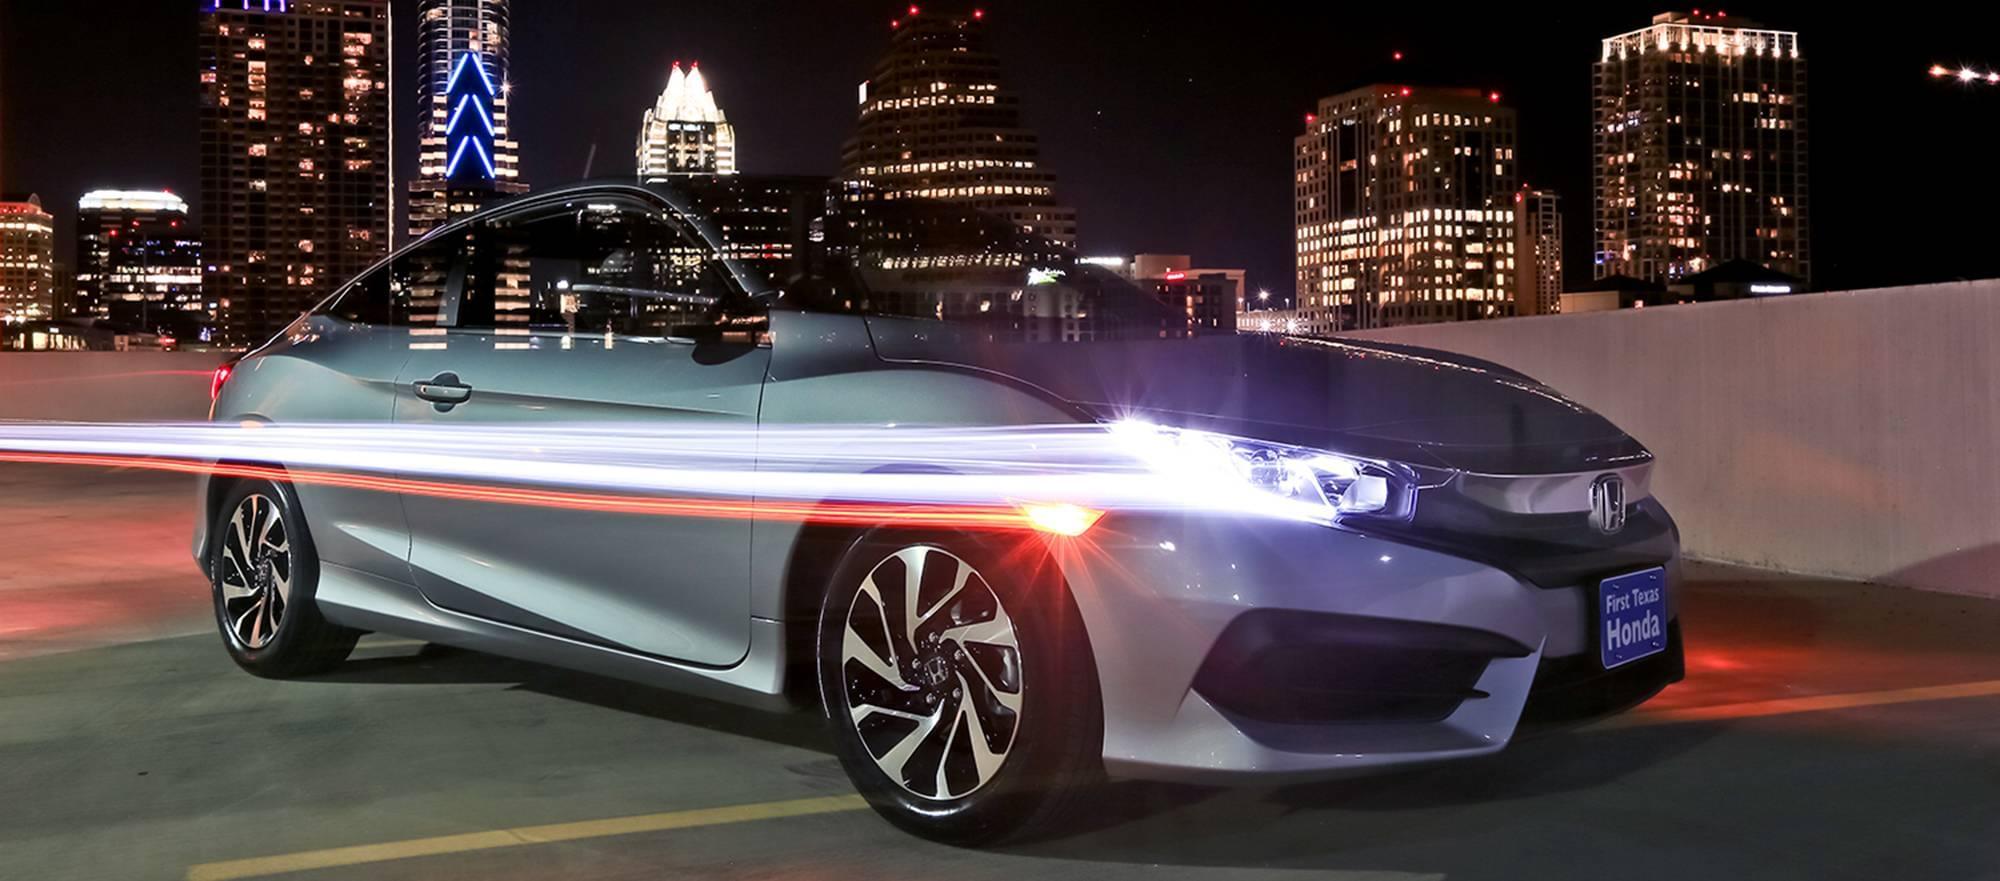 New Honda Civic For Sale In Austin TX